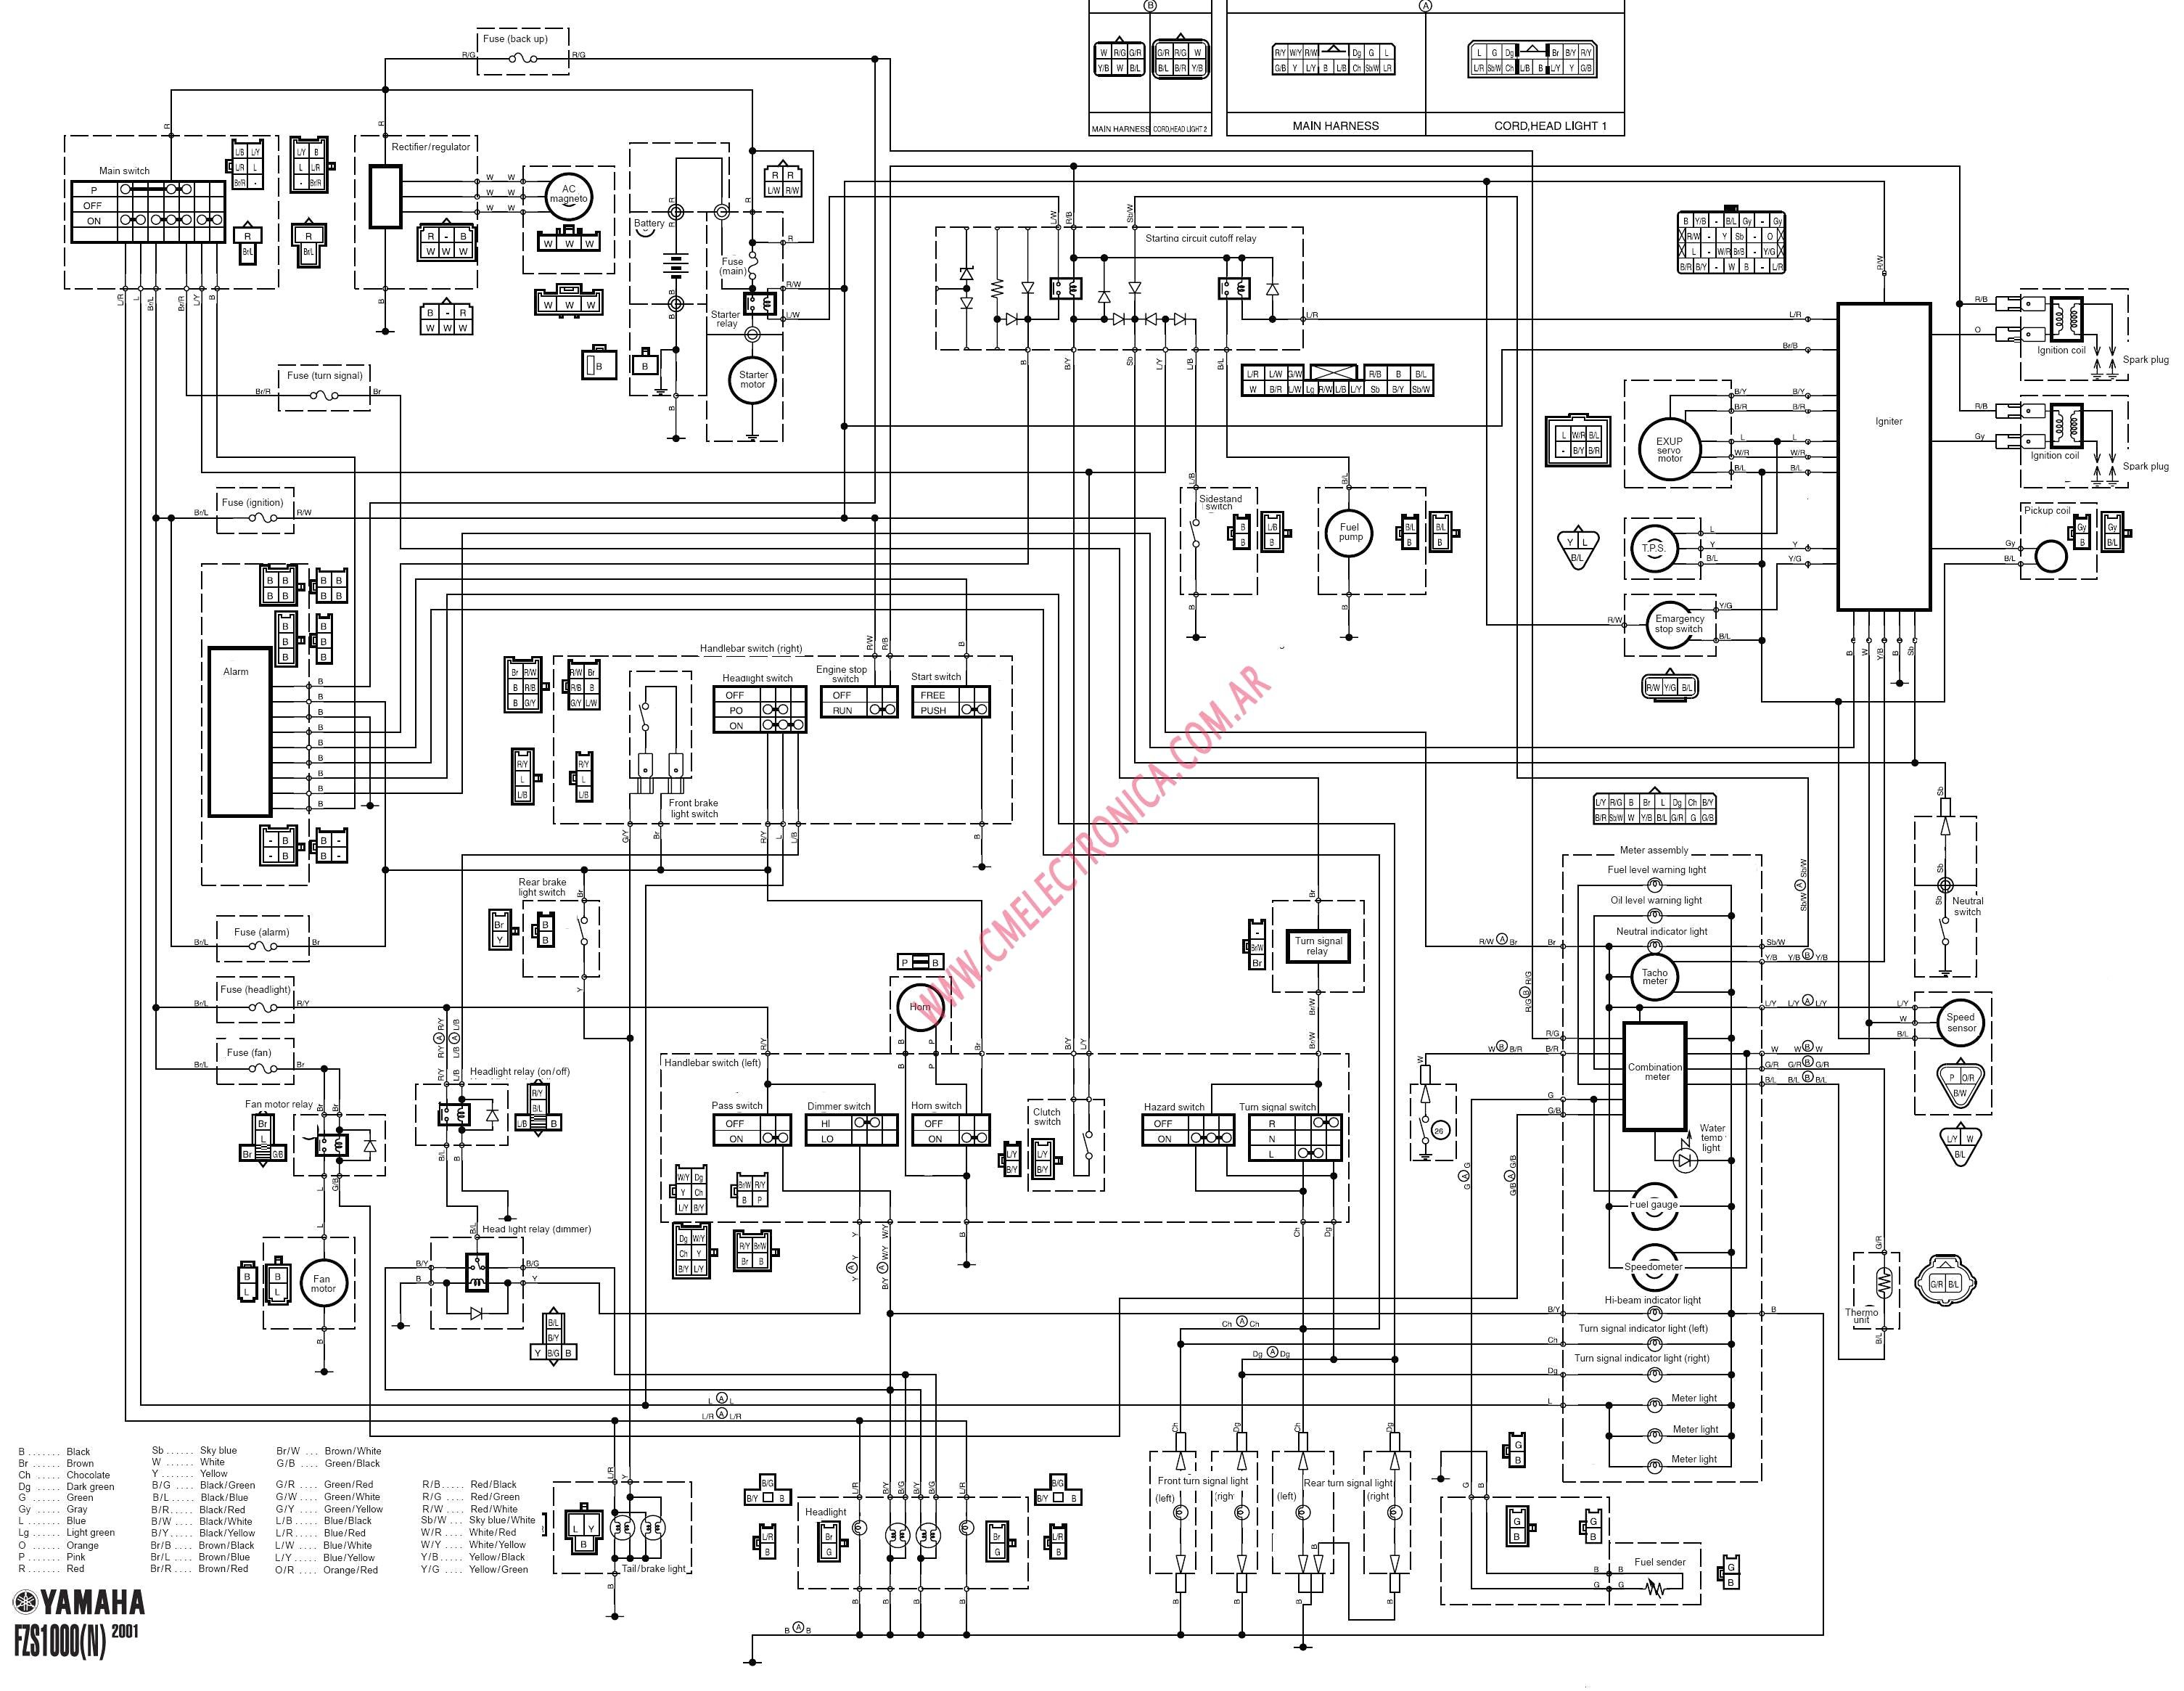 Wiring Diagram For Harley Davidson Radio